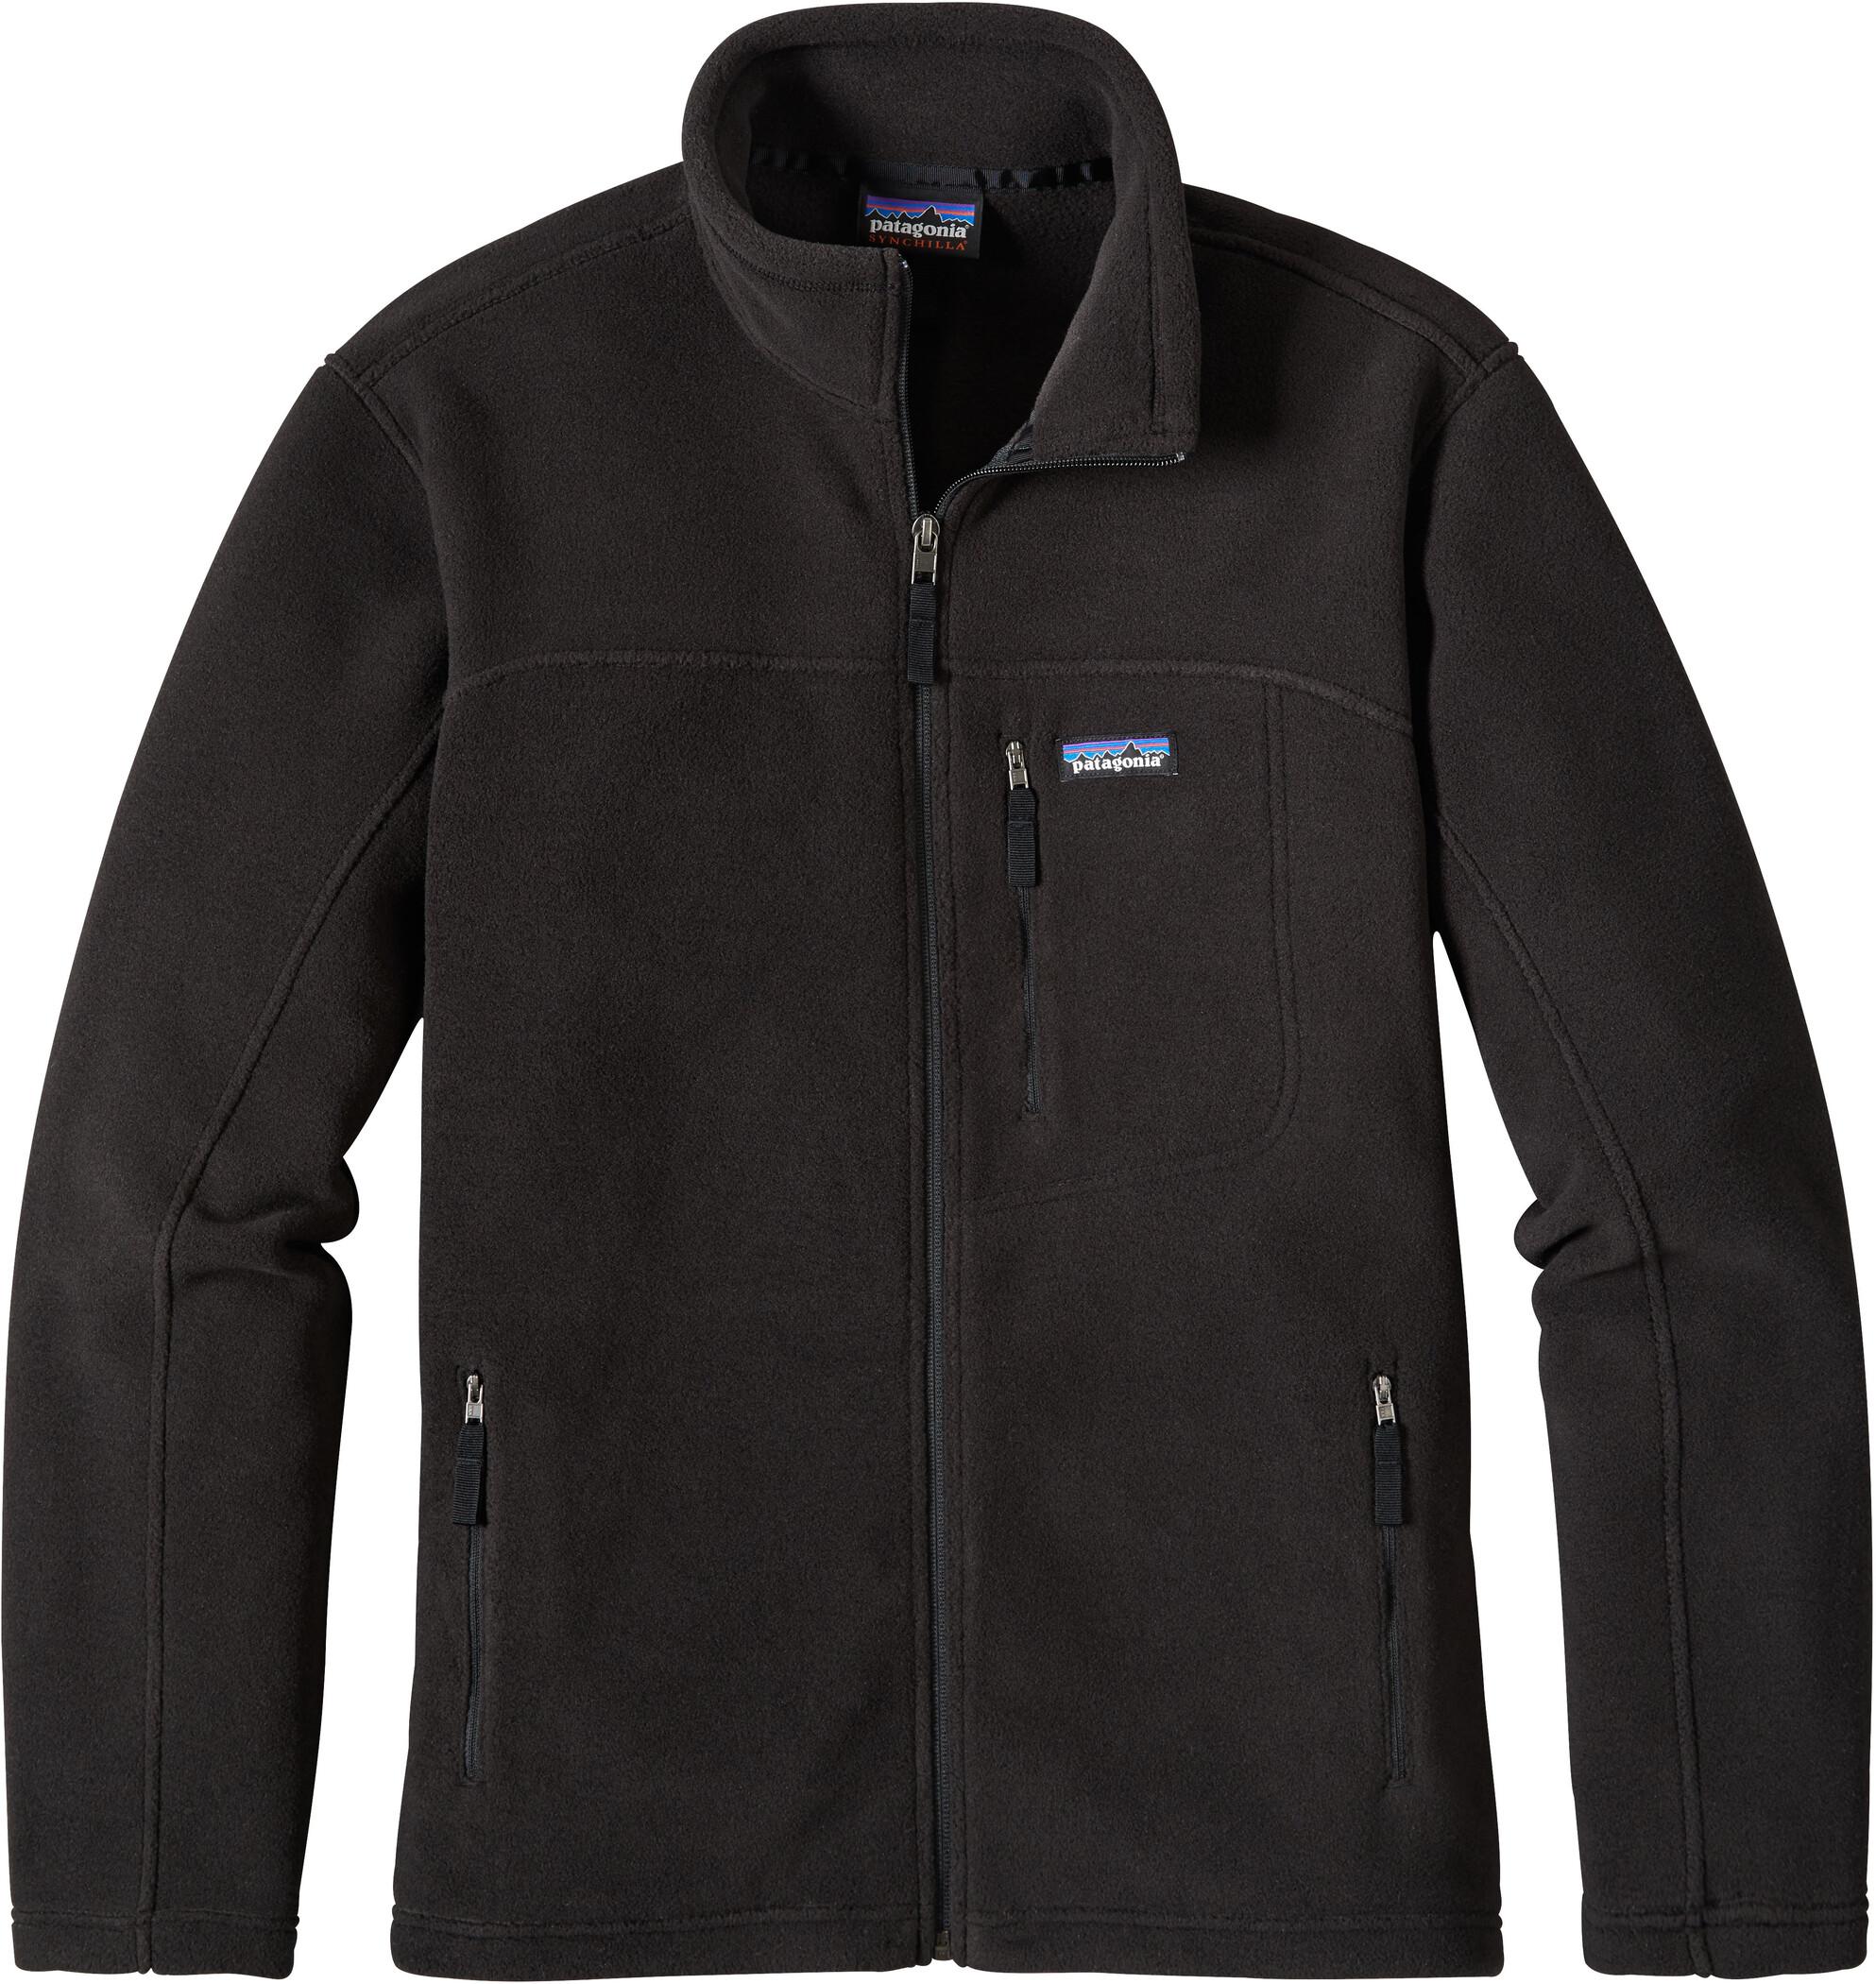 Patagonia Classic Synchilla Jacket Men black